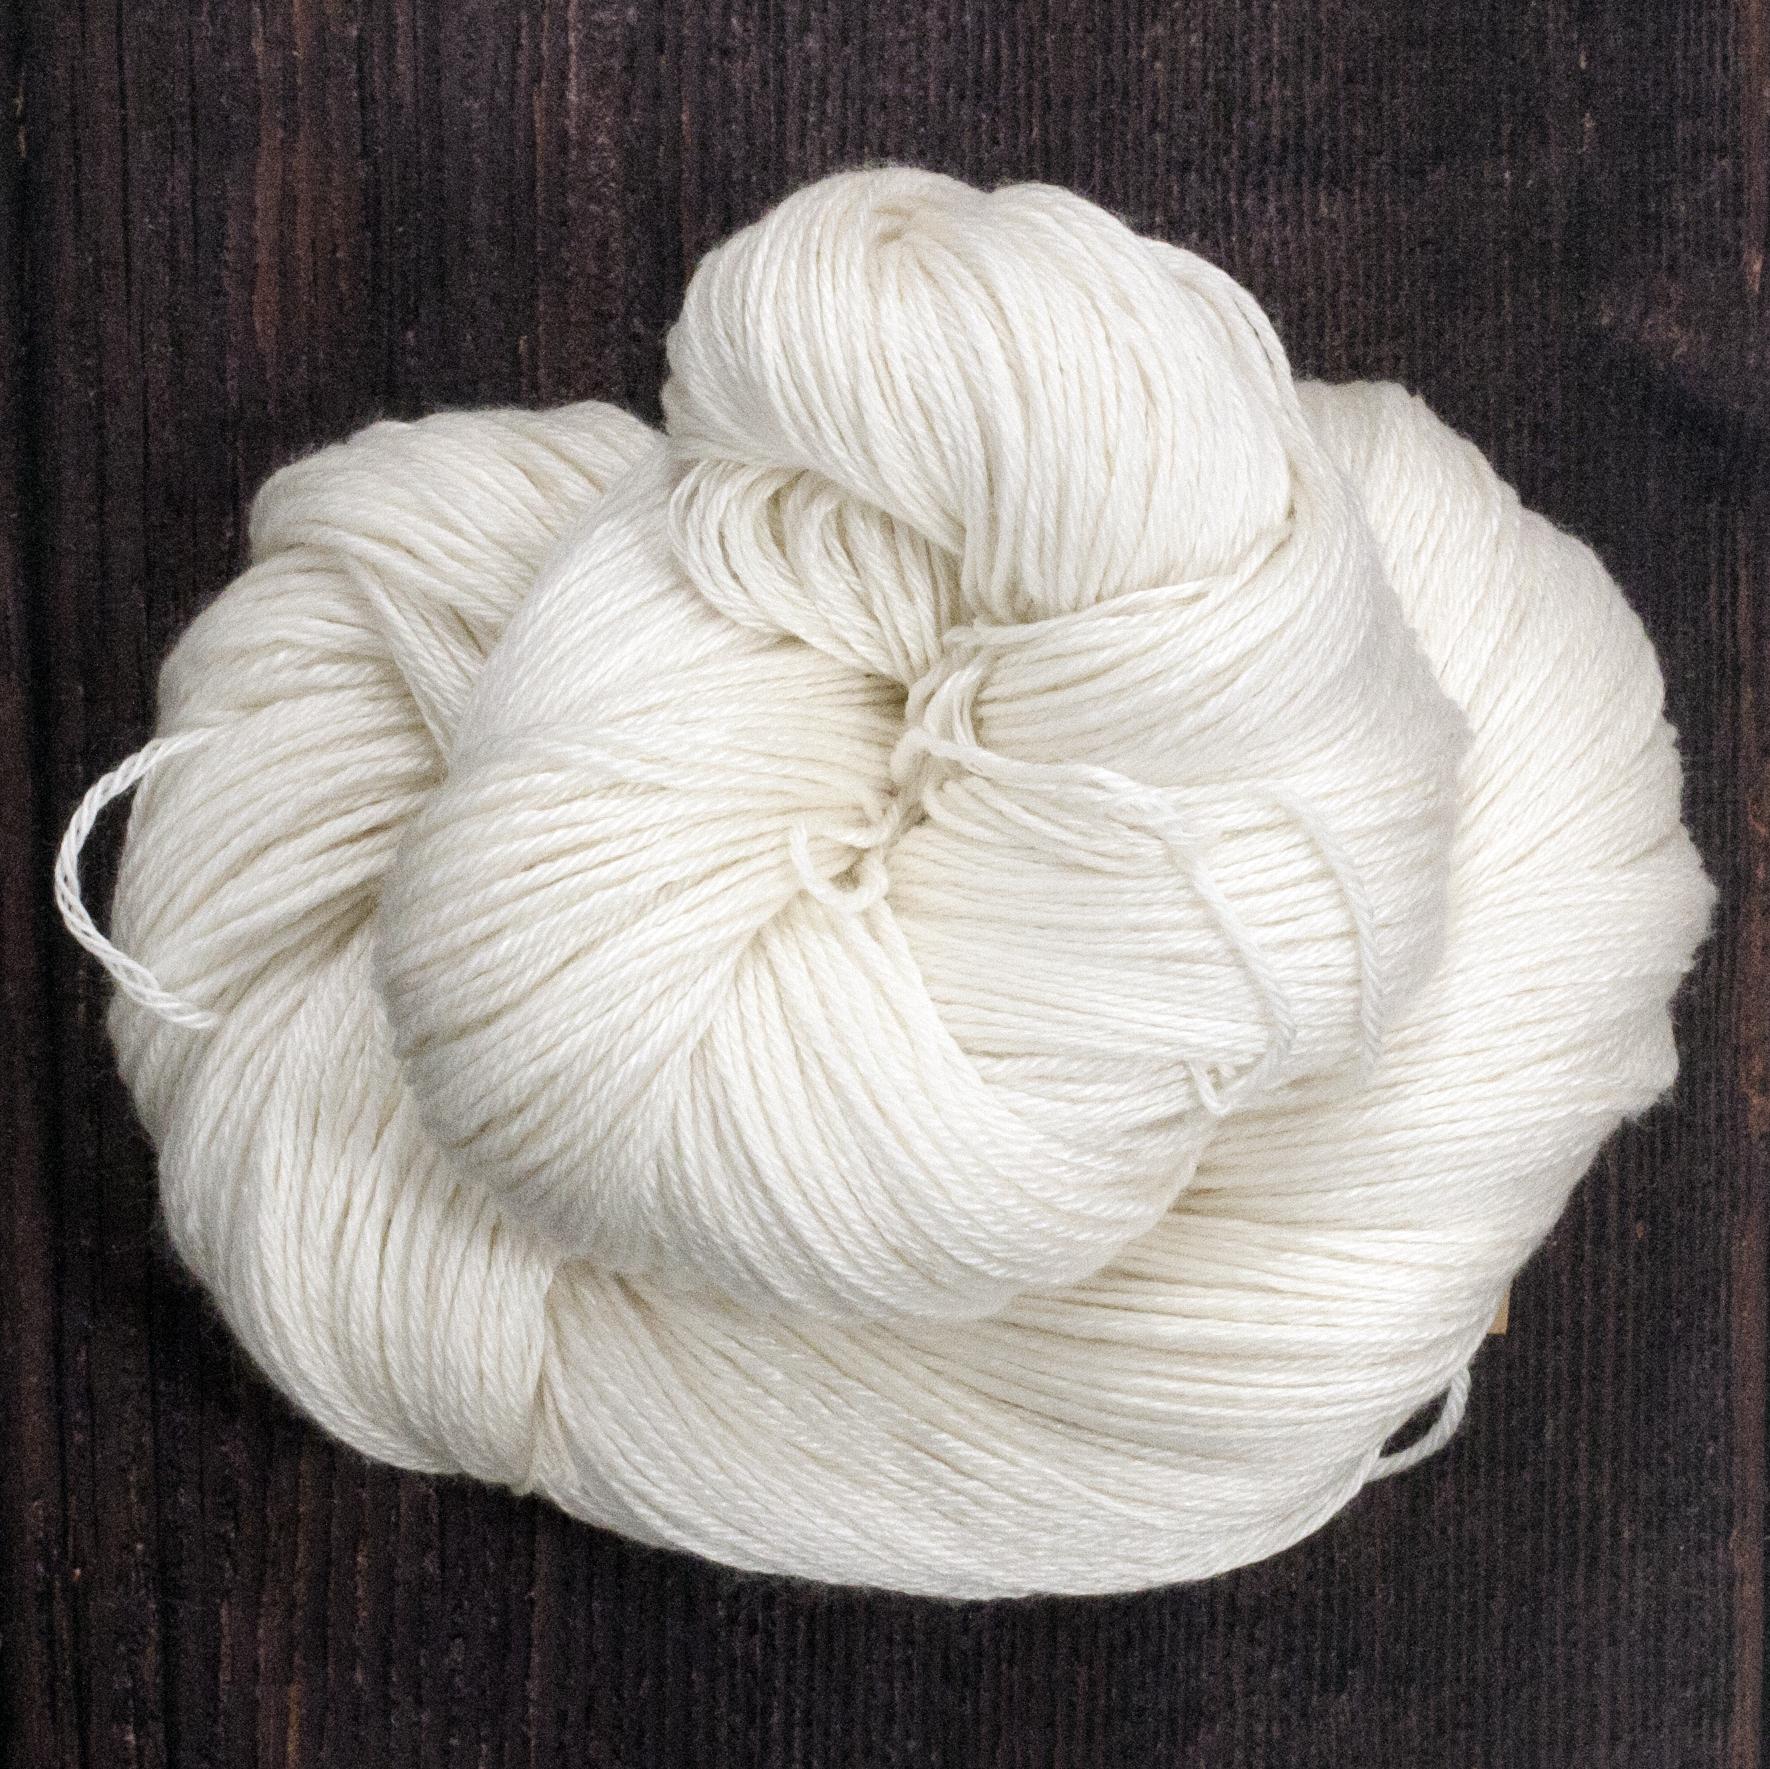 100/% linen yarn undyed 2ply fingering 100gms